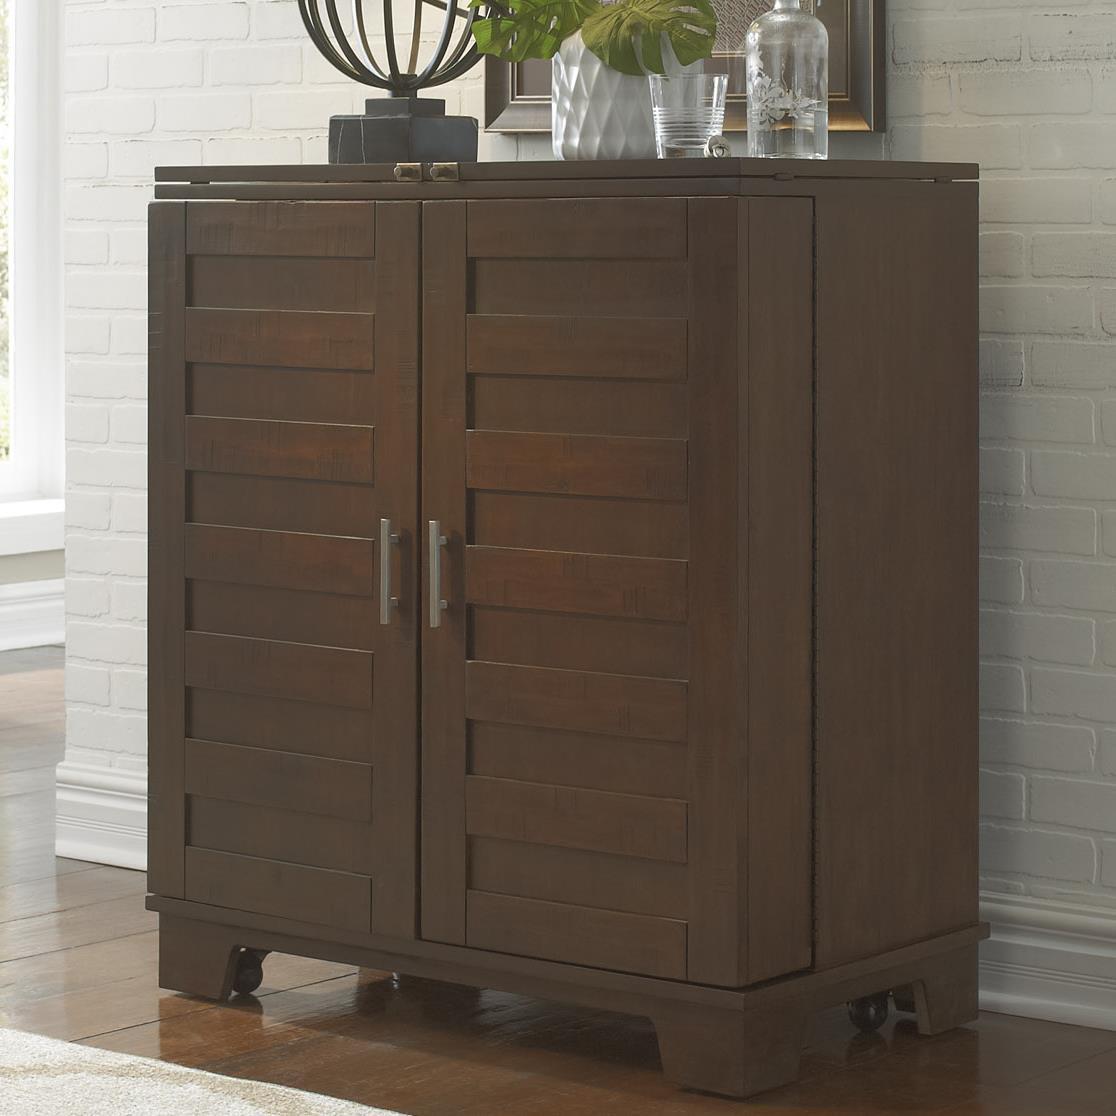 Liberty Furniture Pebble Creek Wine Cabinet - Item Number: 476-WC3742